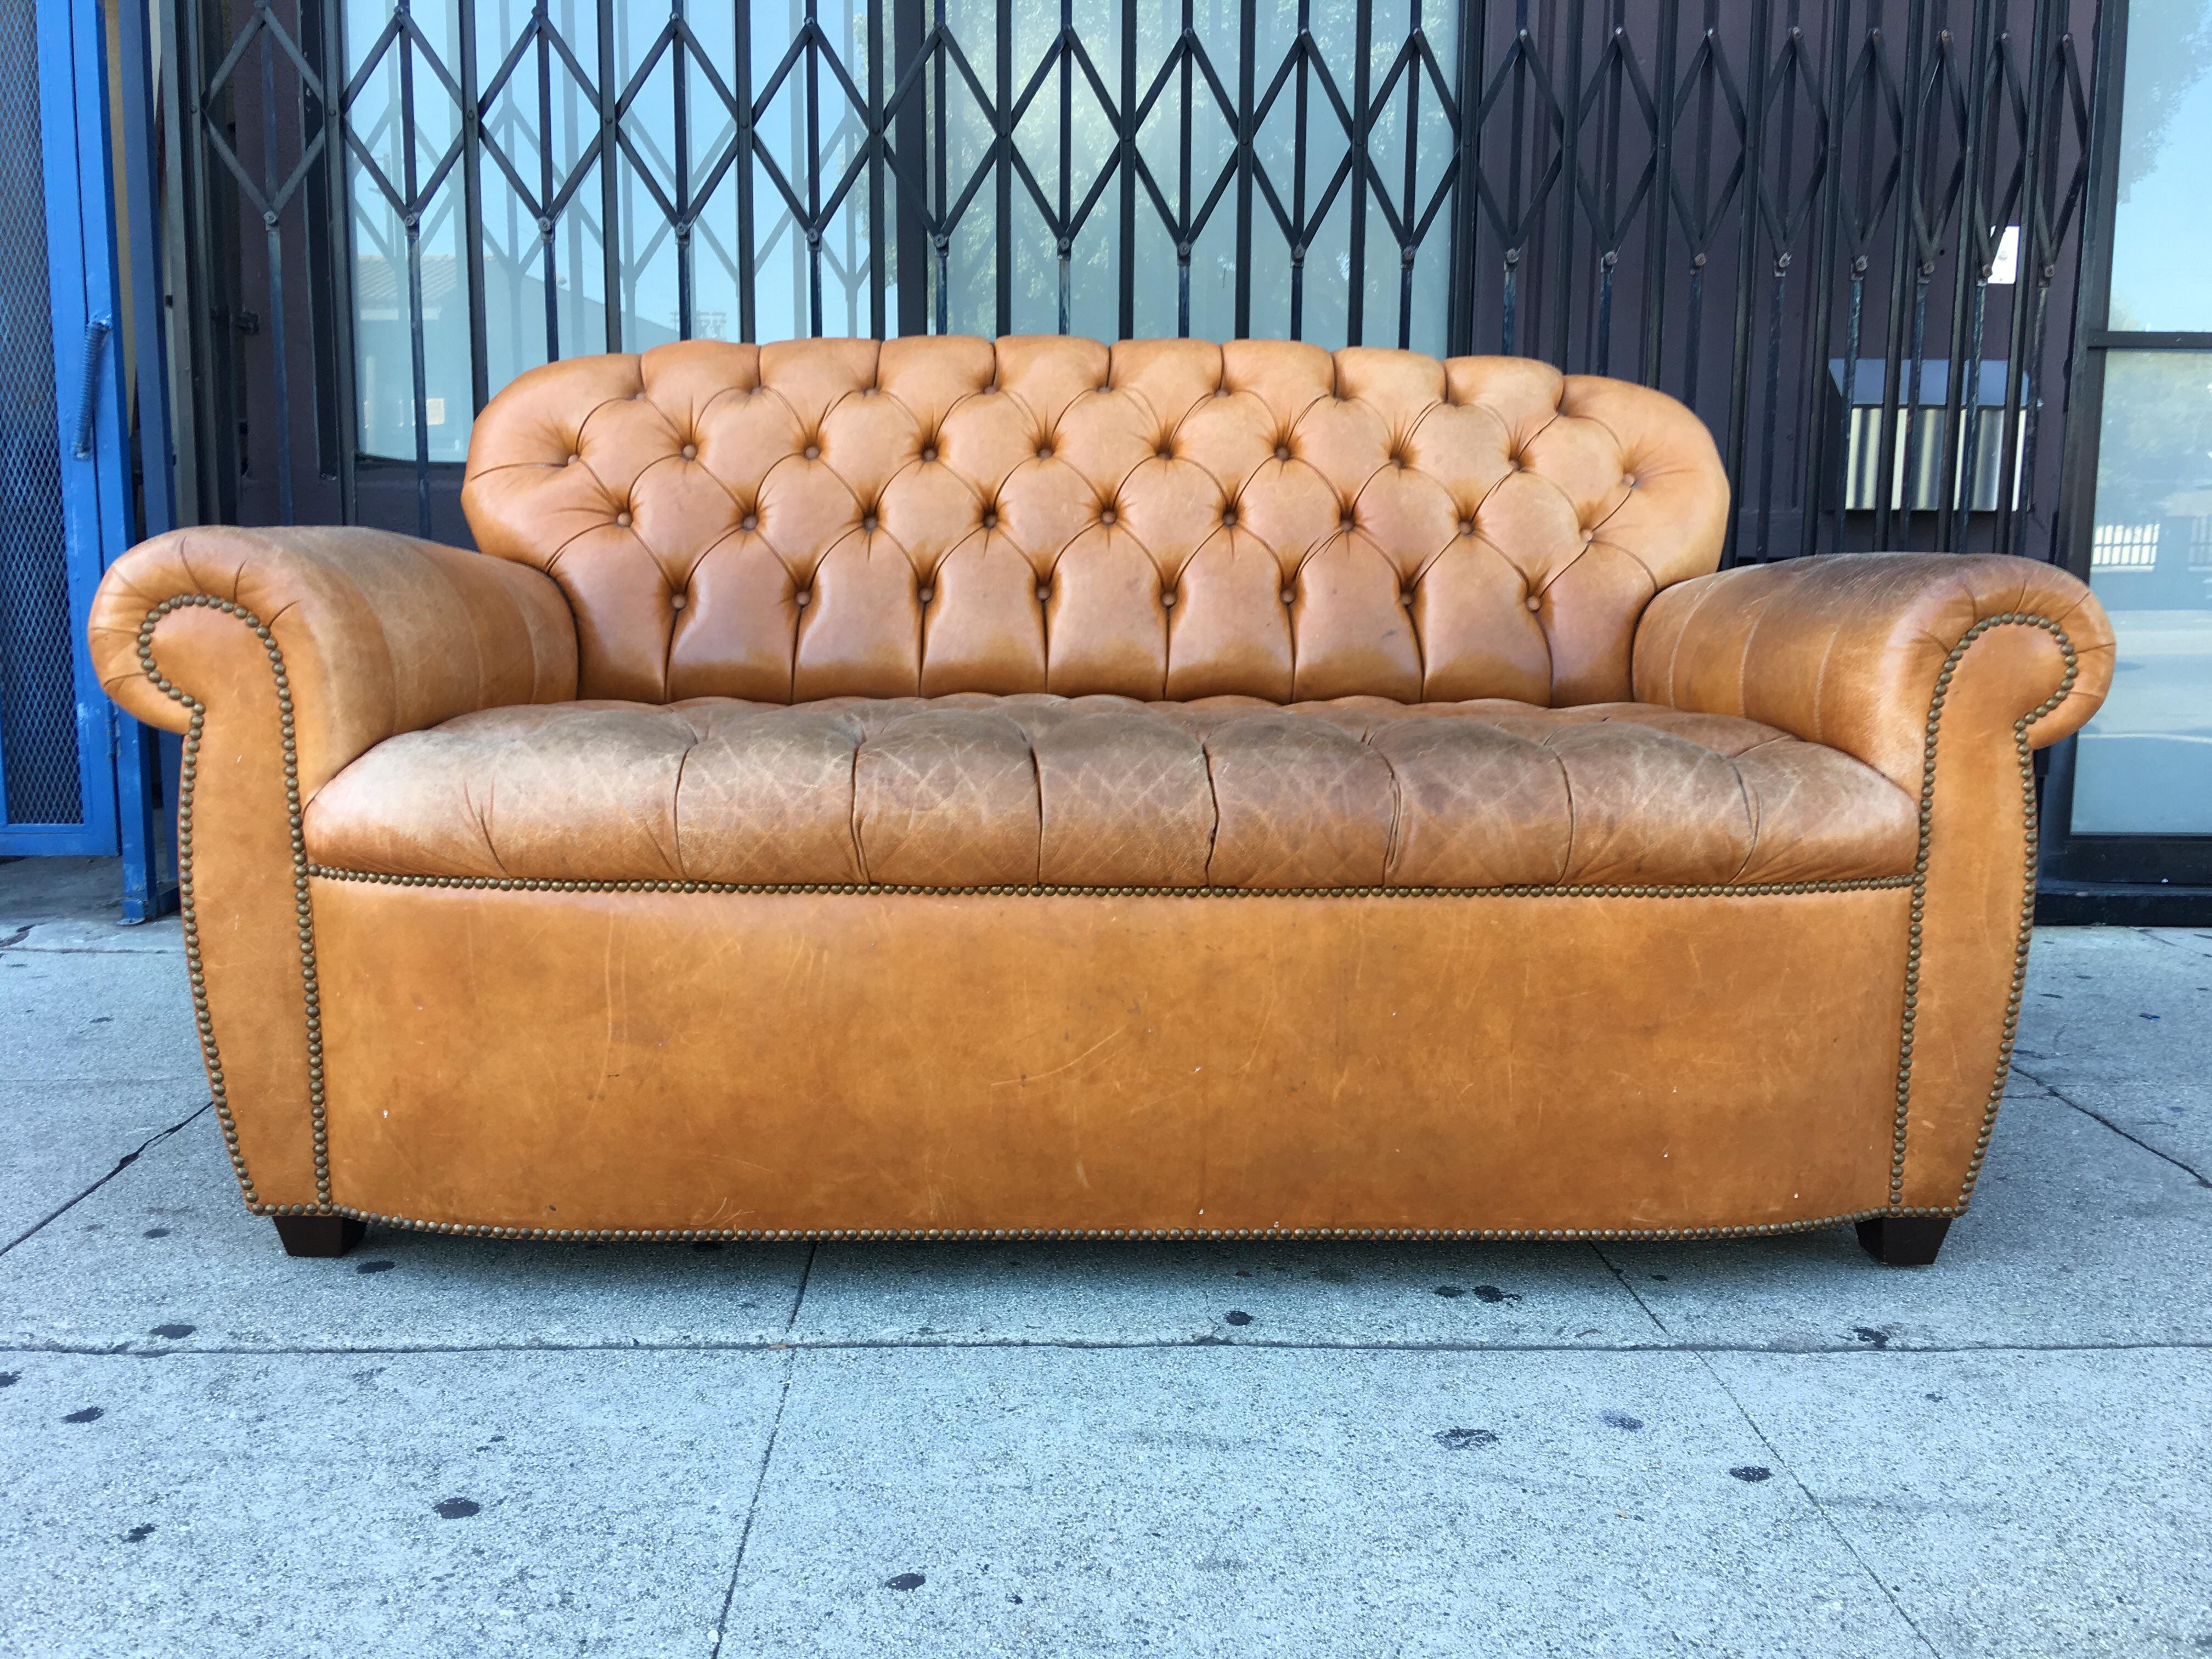 Vintage Tufted Aged Leather Sofa   Image 2 Of 7